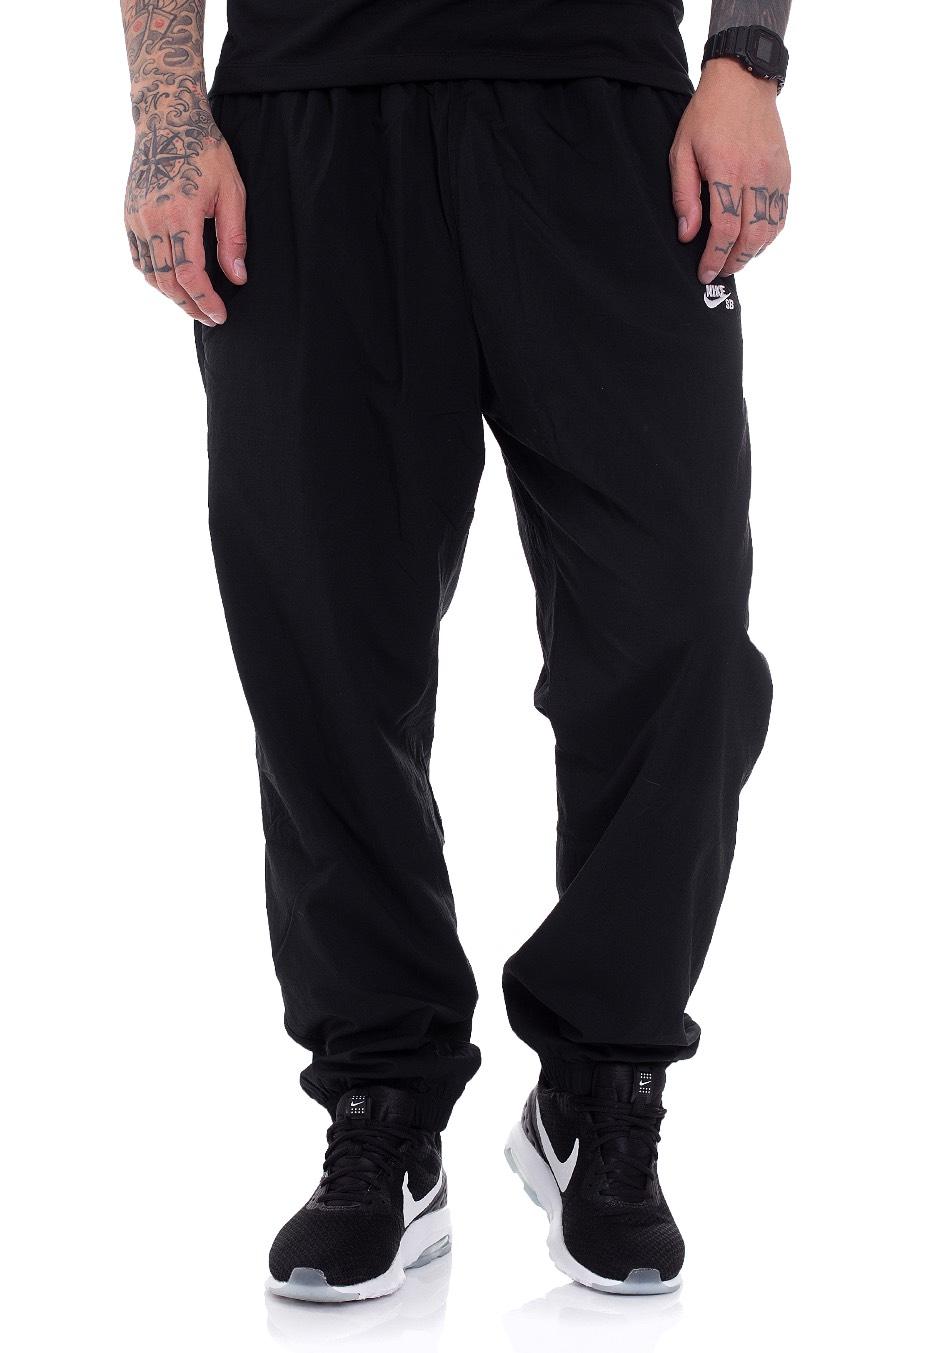 d16885ec24f2 Nike SB - SB Black White - Sweat Pants - Streetwear Shop - Impericon.com AU